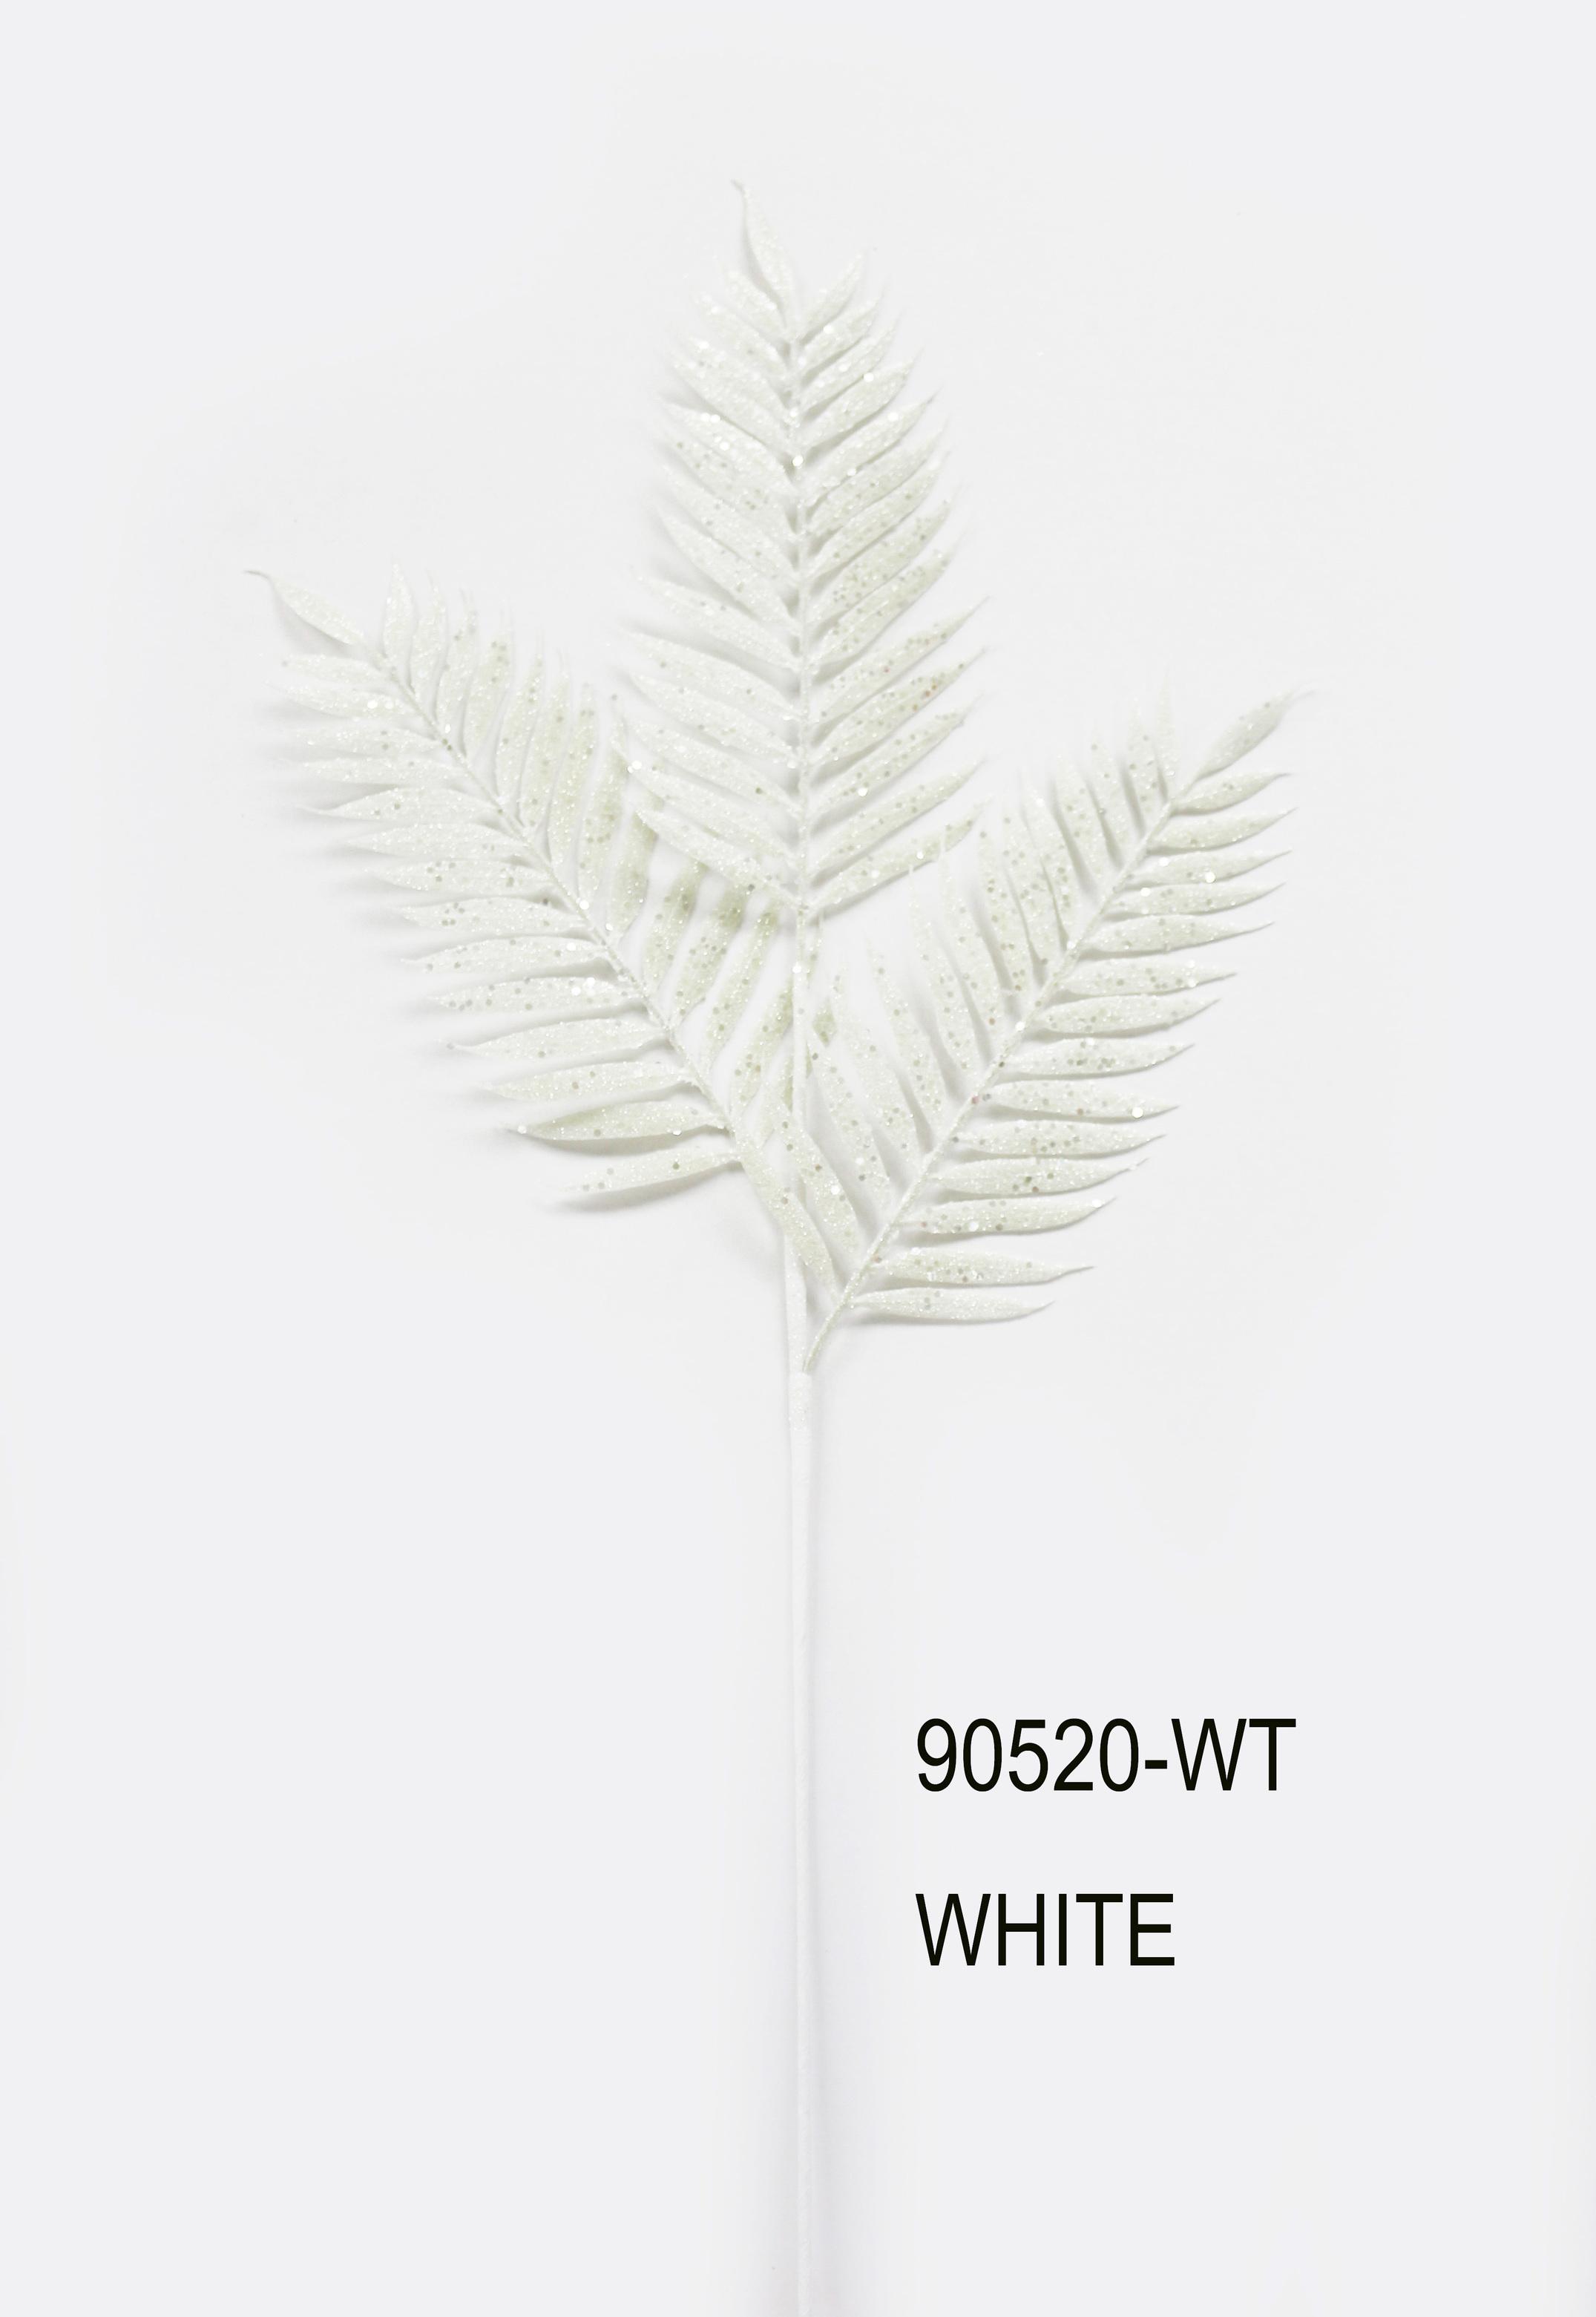 90520-WT